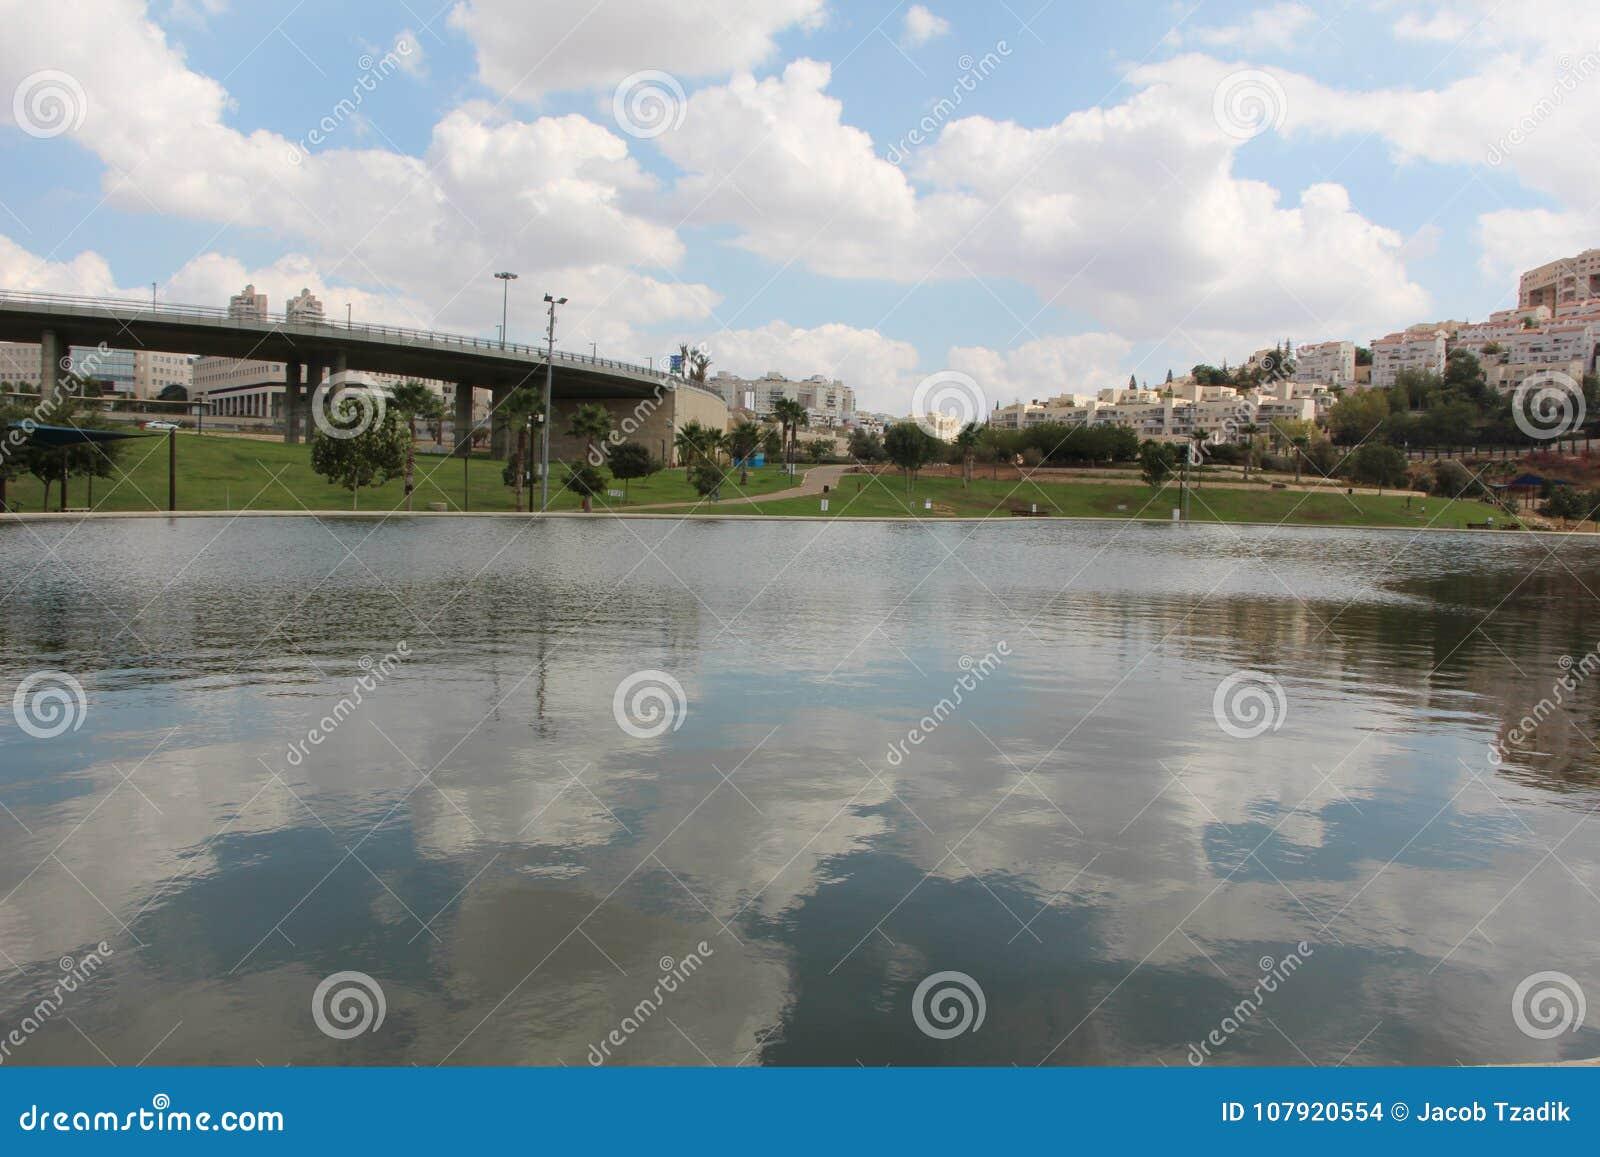 Kunstmatig meer van Modiin, Israël